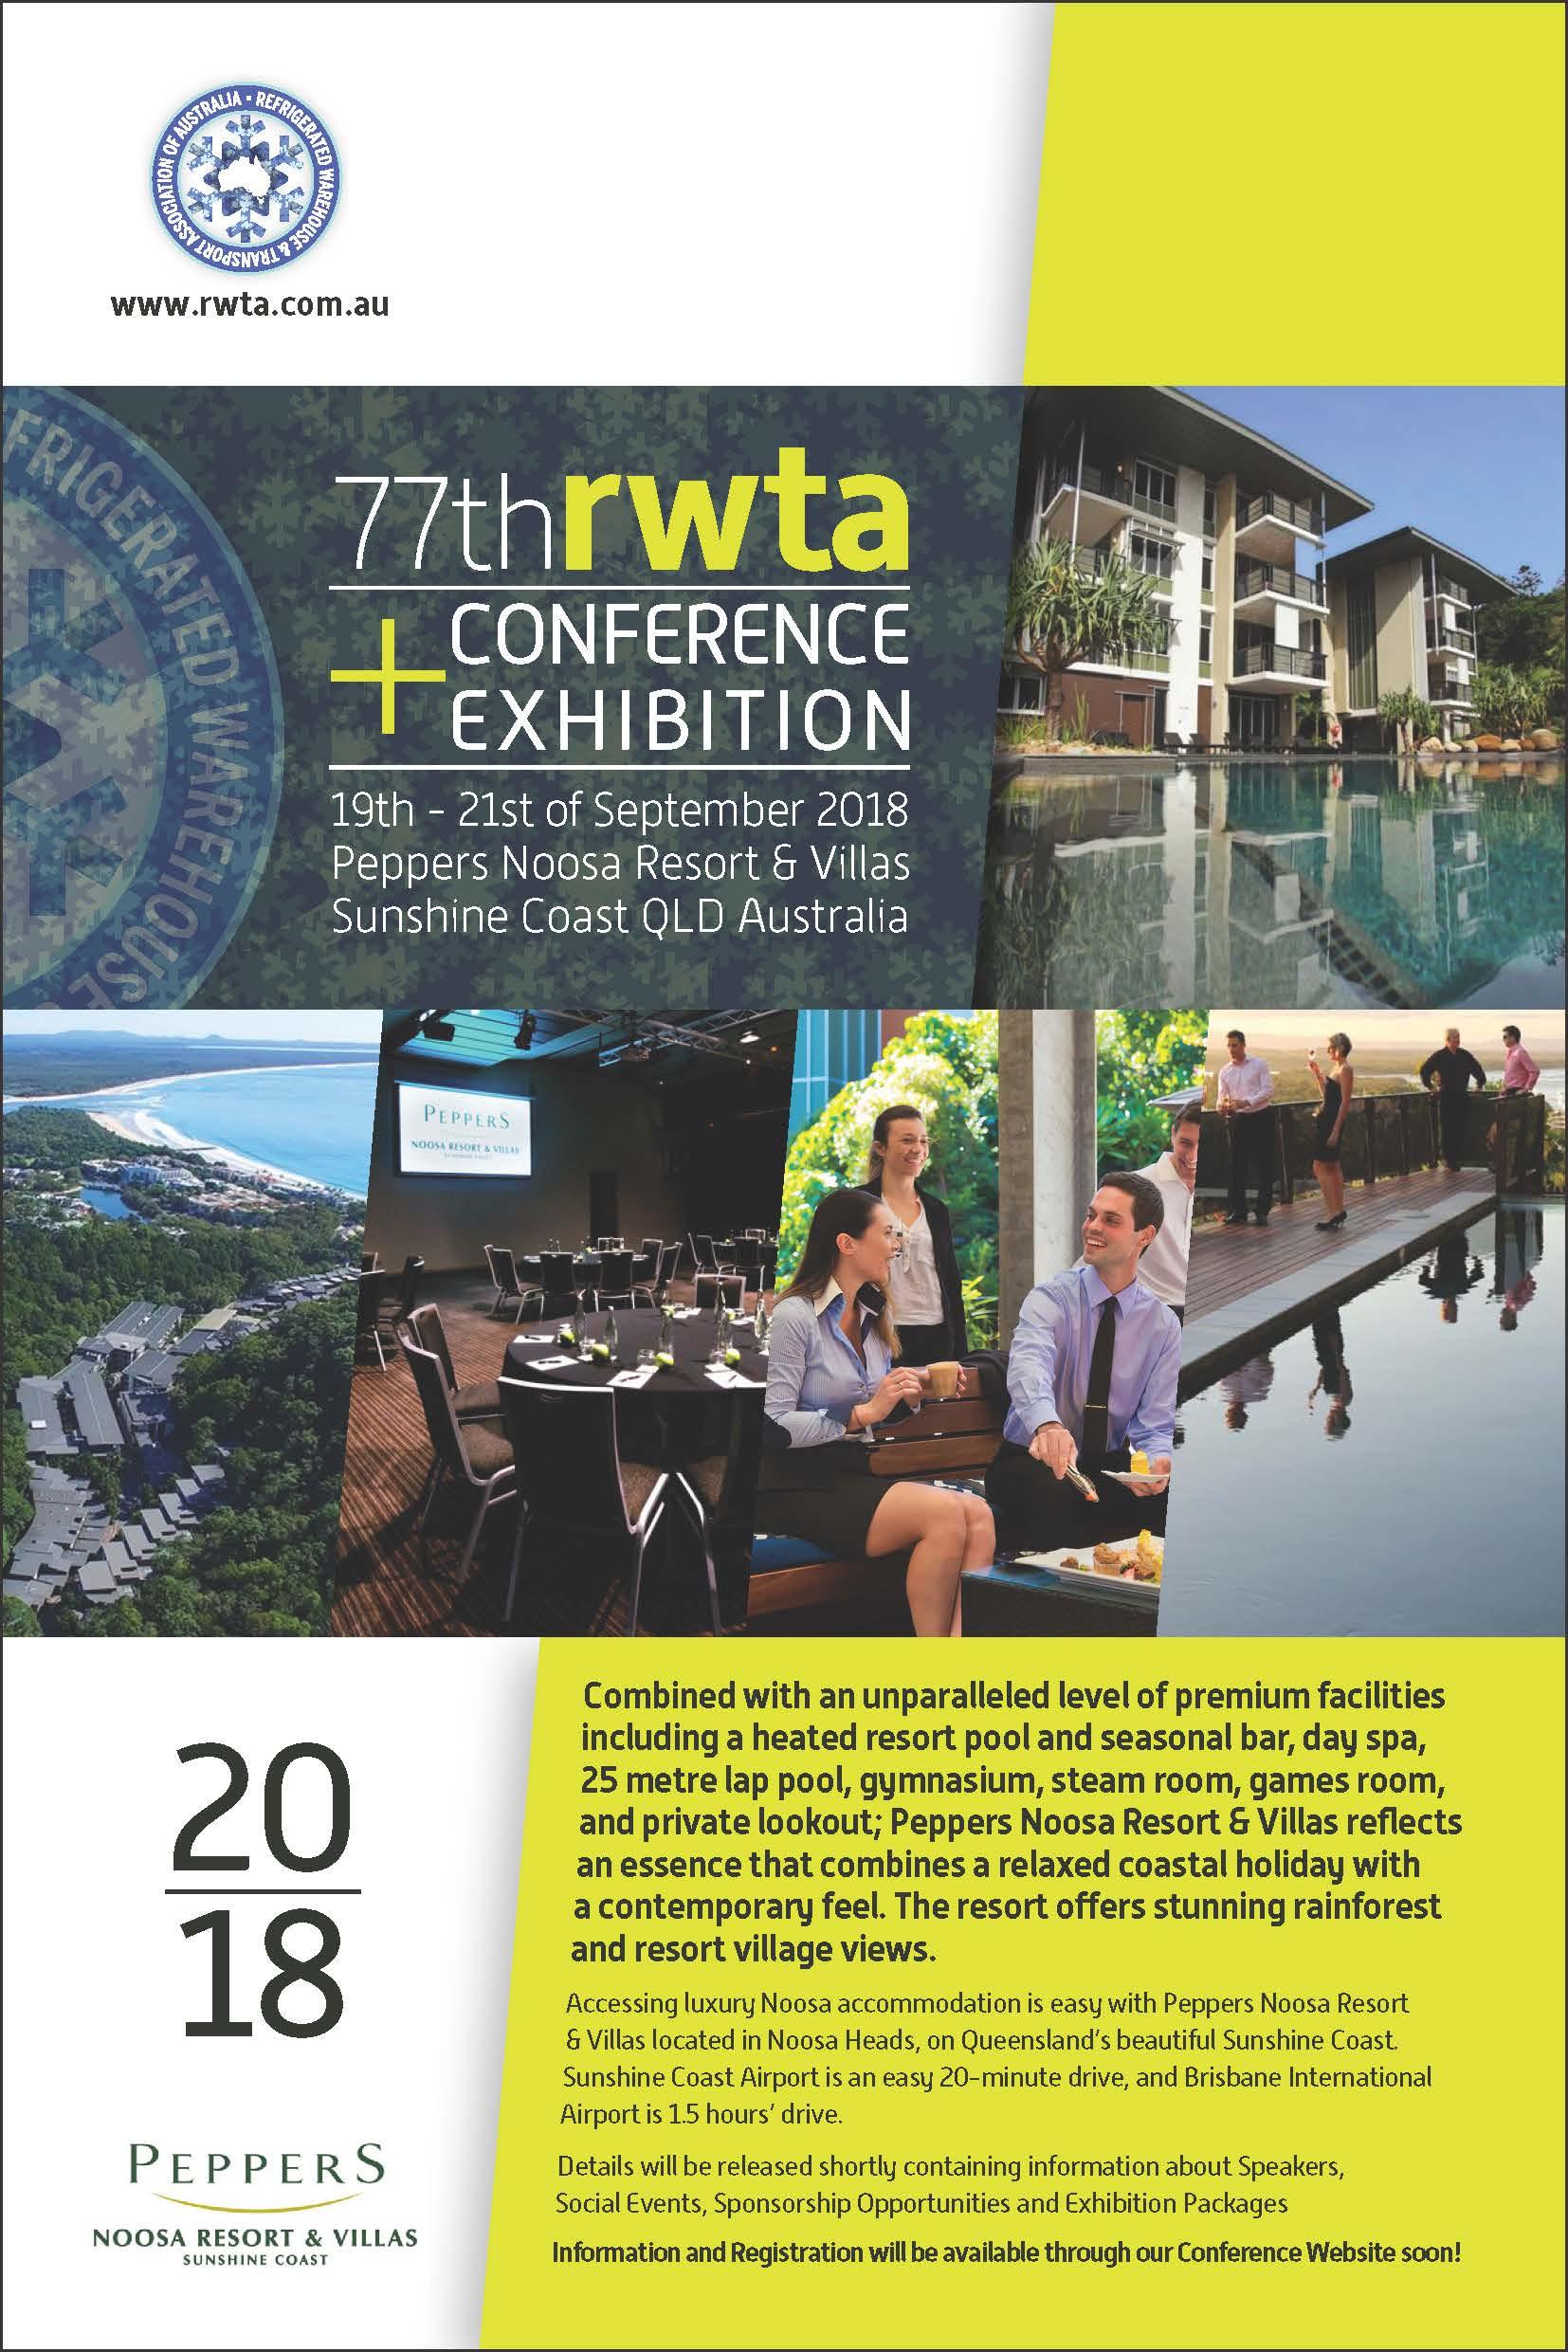 12188_RWTA_2018 Conference_Final.jpg